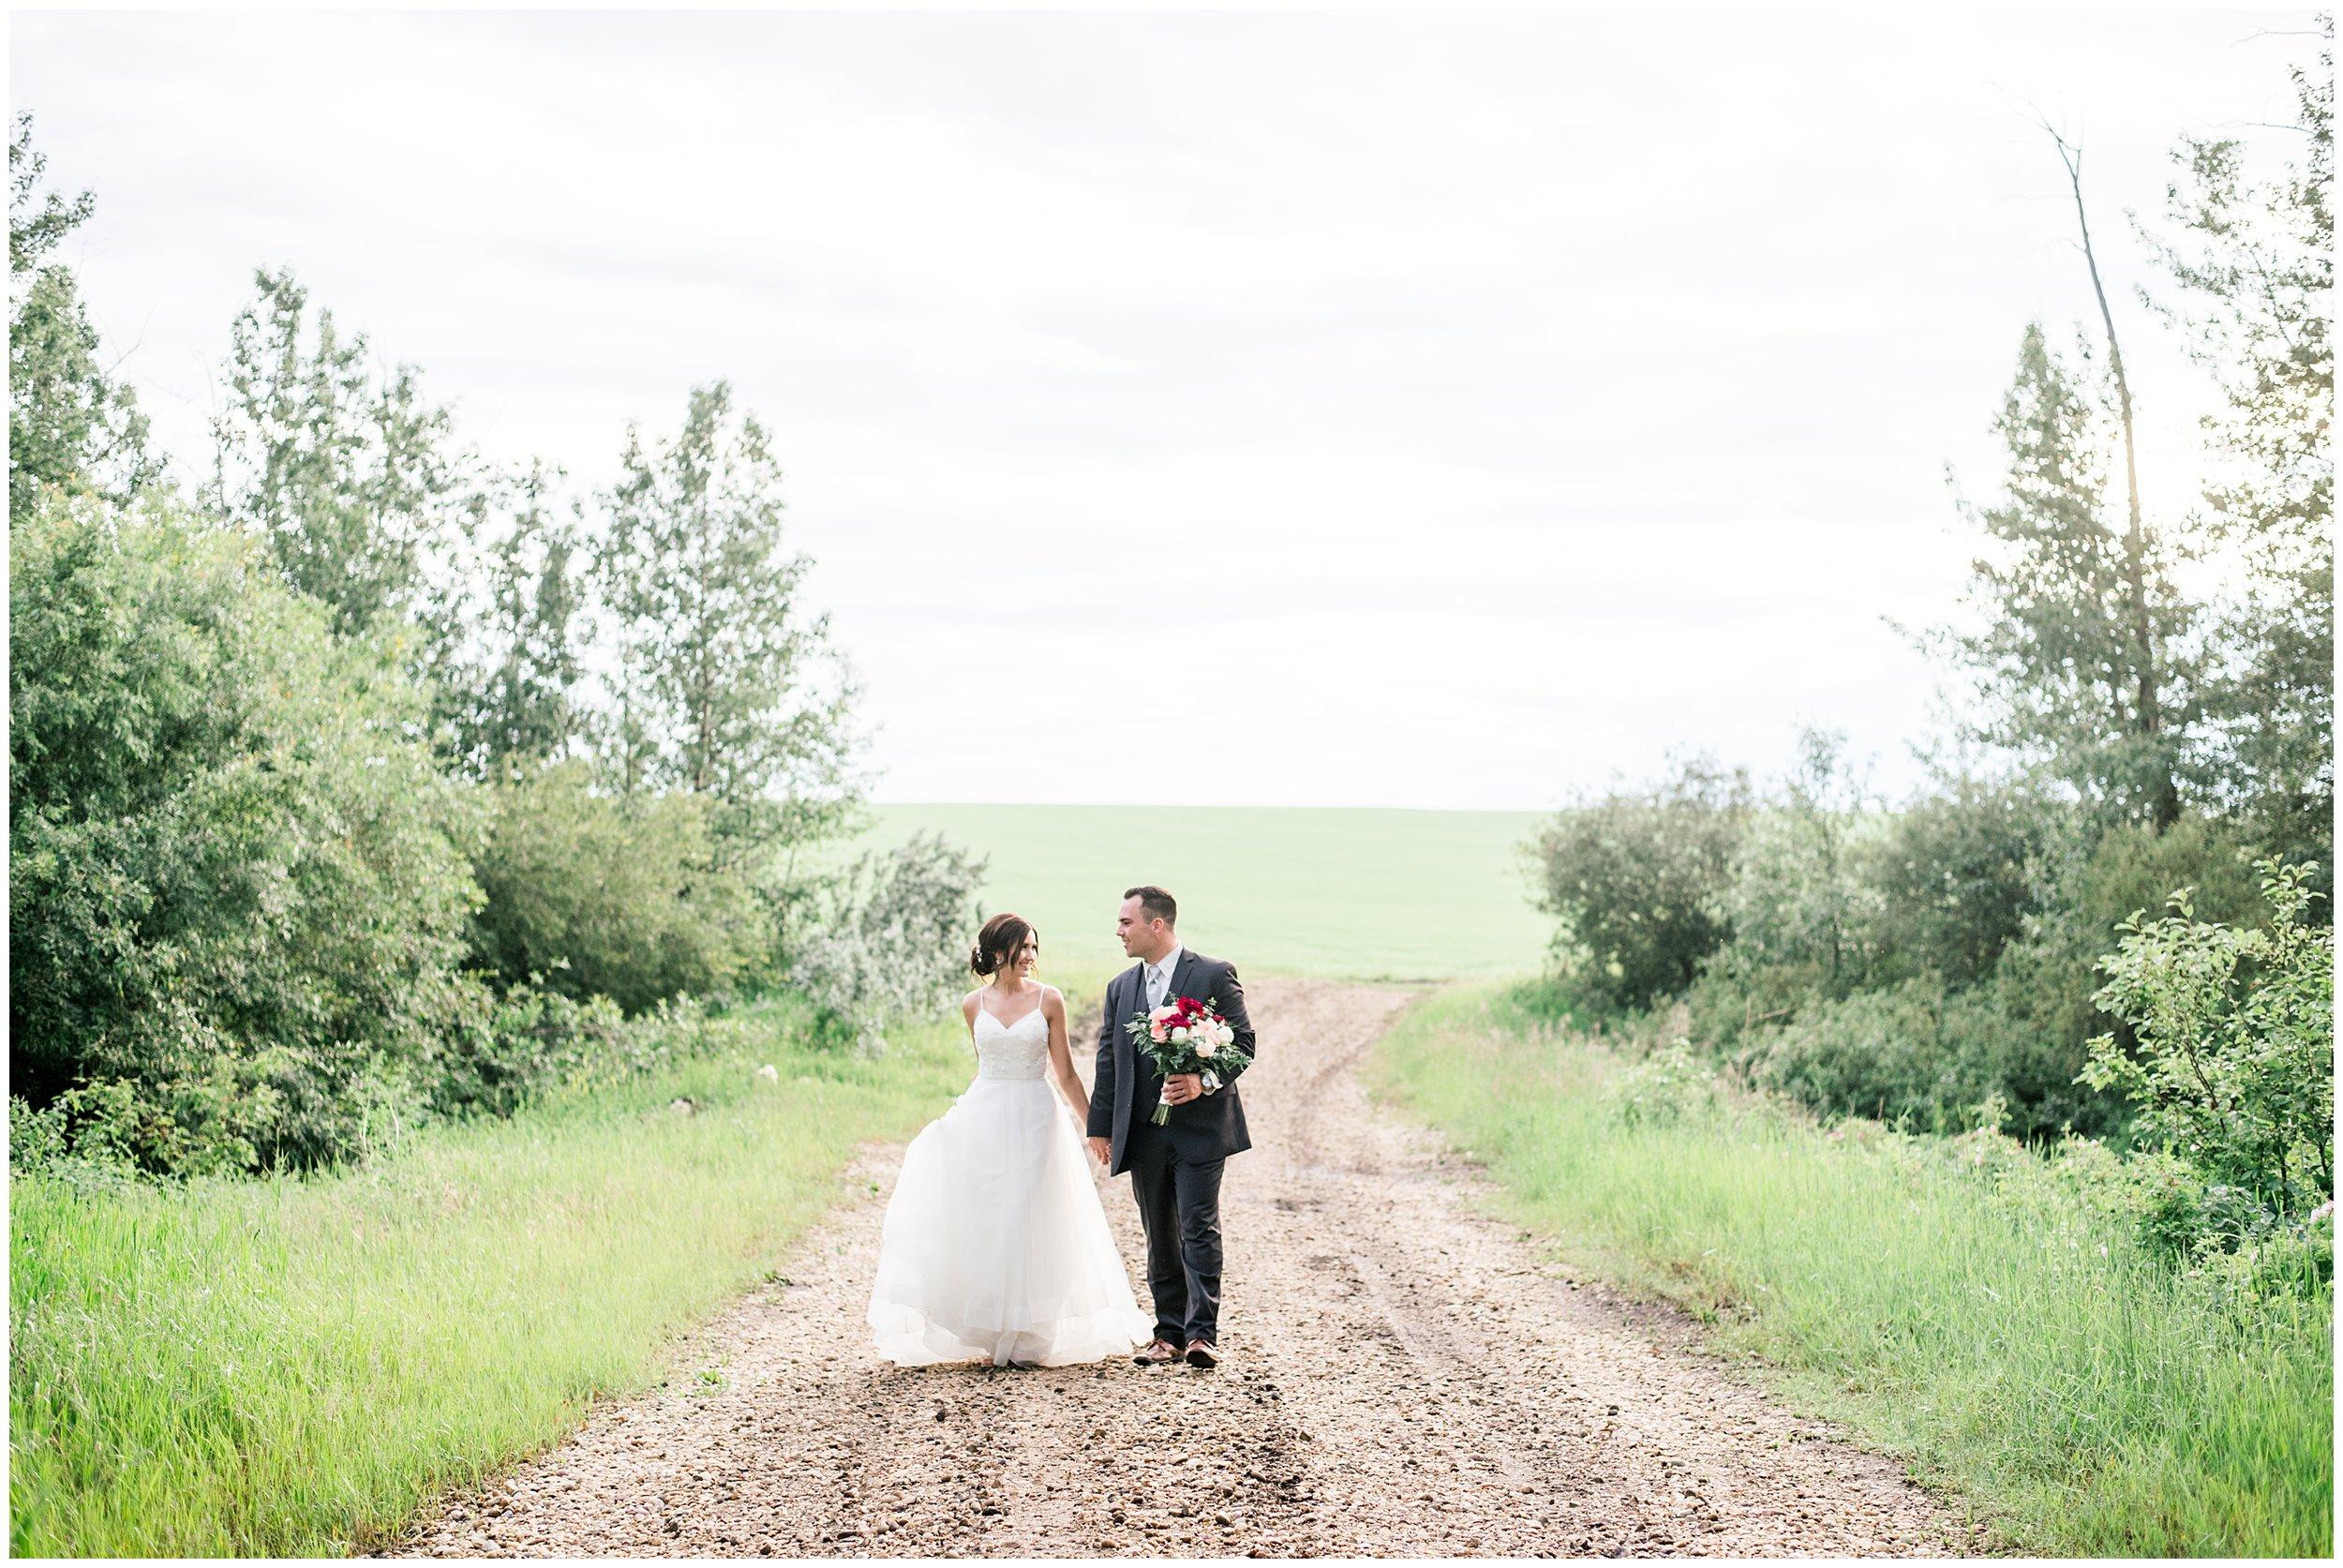 Alyssa-Poland-Photography_0607_alberta wedding.jpg